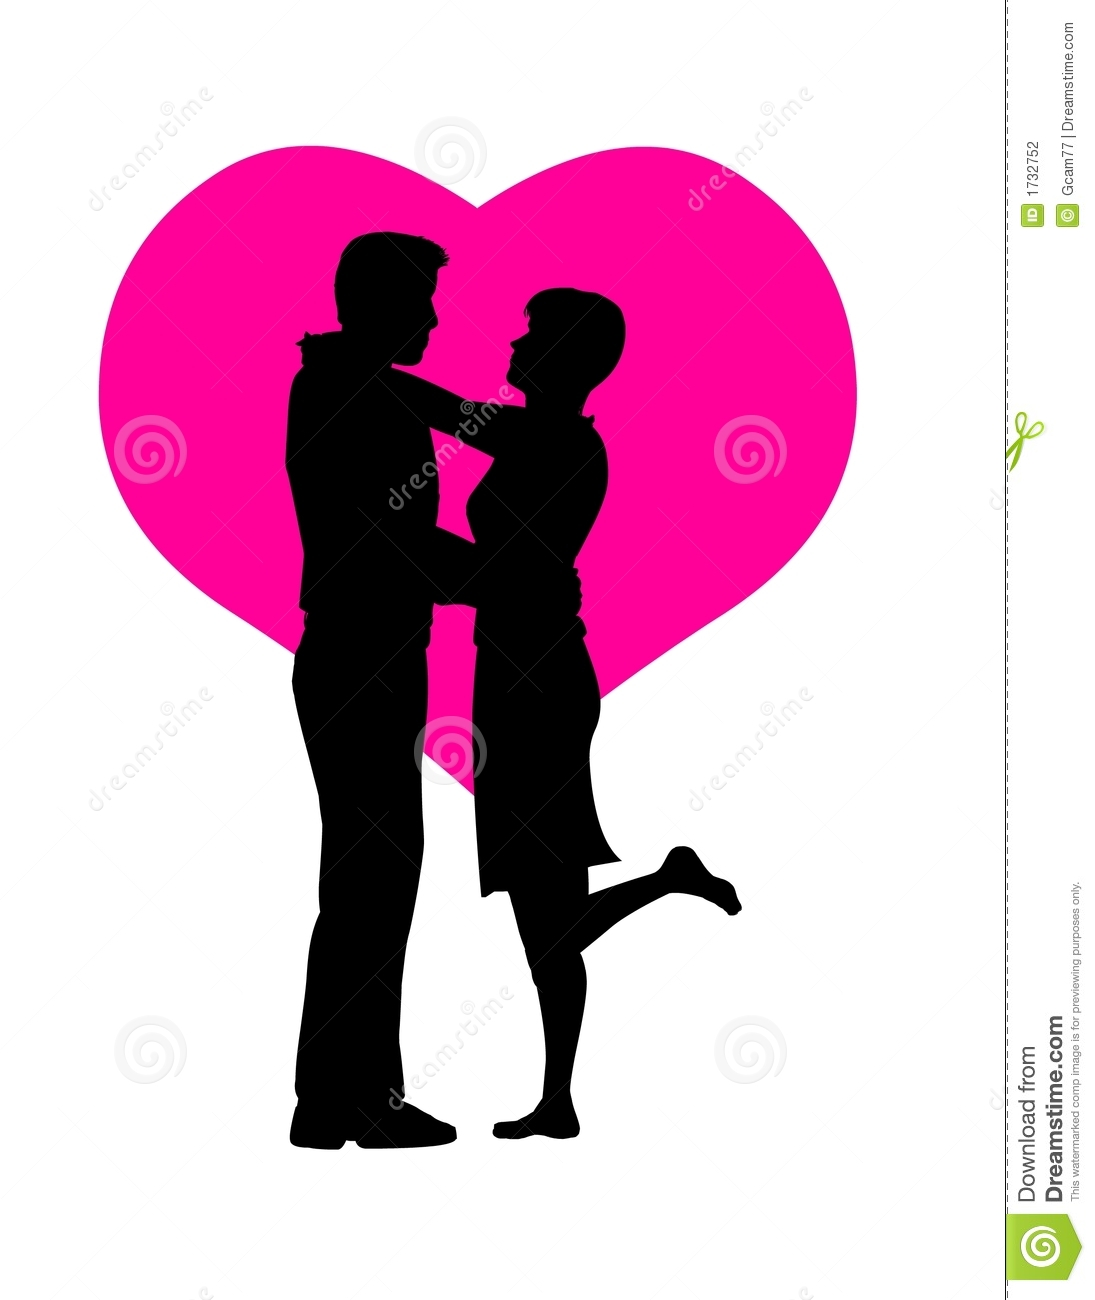 1095x1300 Love Clipart Romance